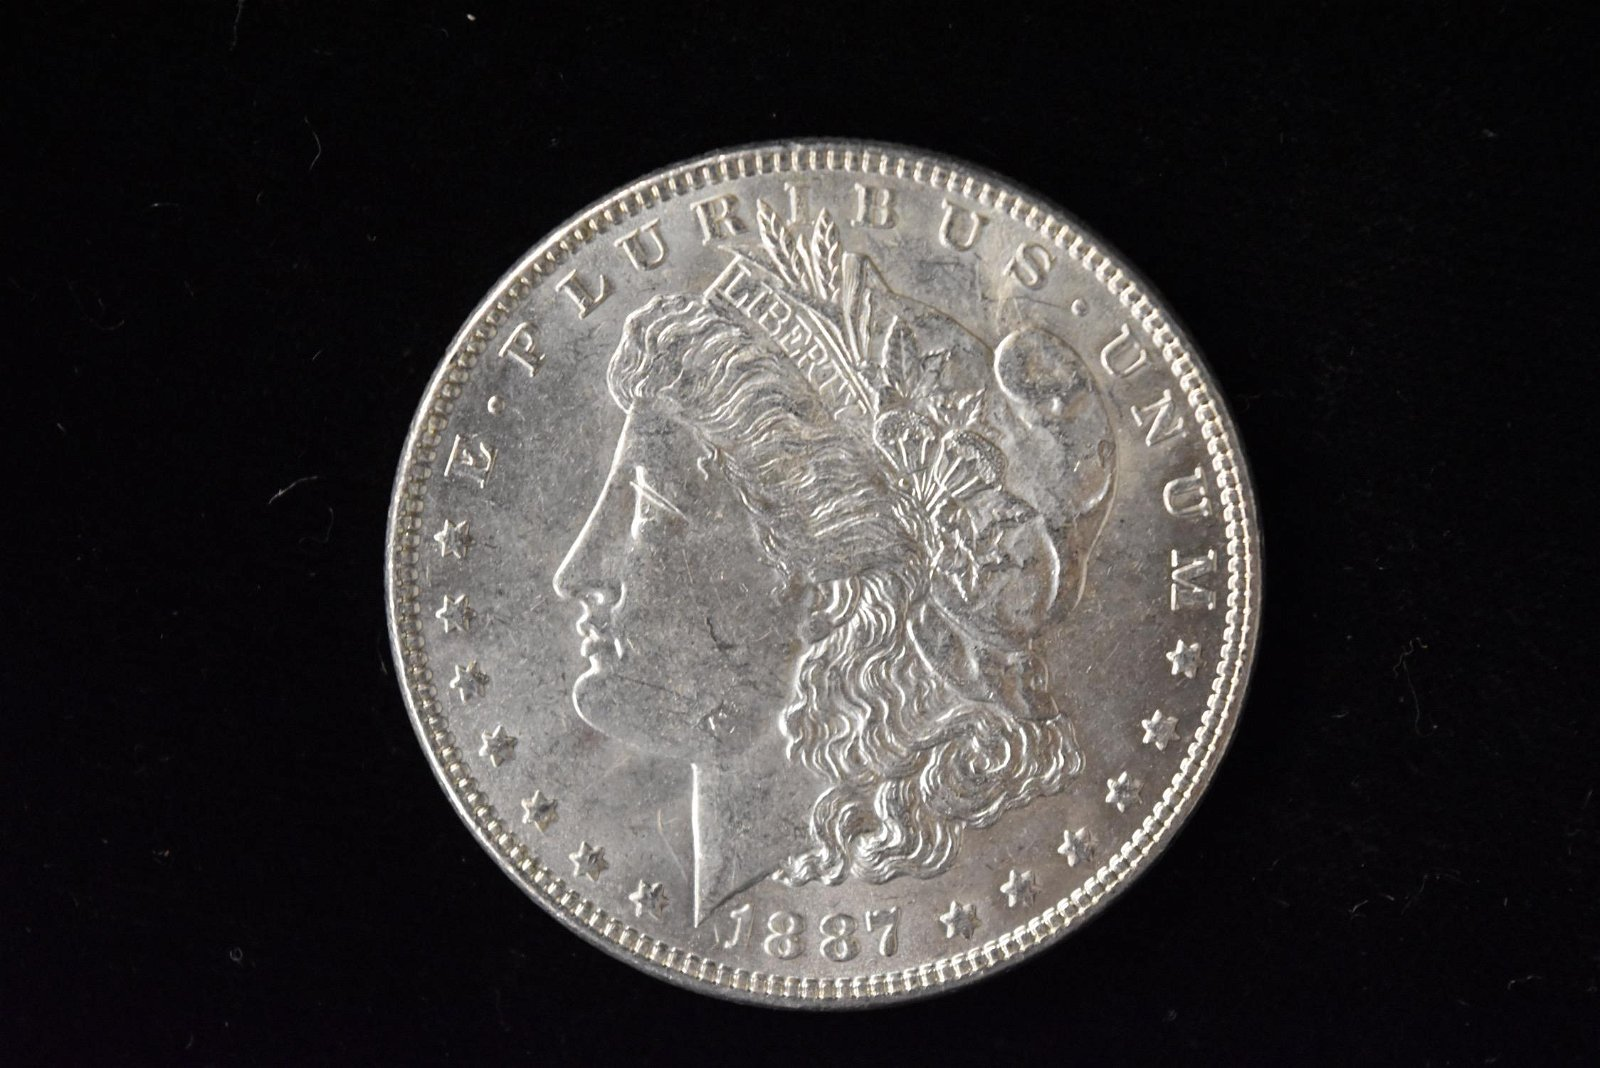 1887 High Grade Morgan Silver Dollar Grade By Picture.